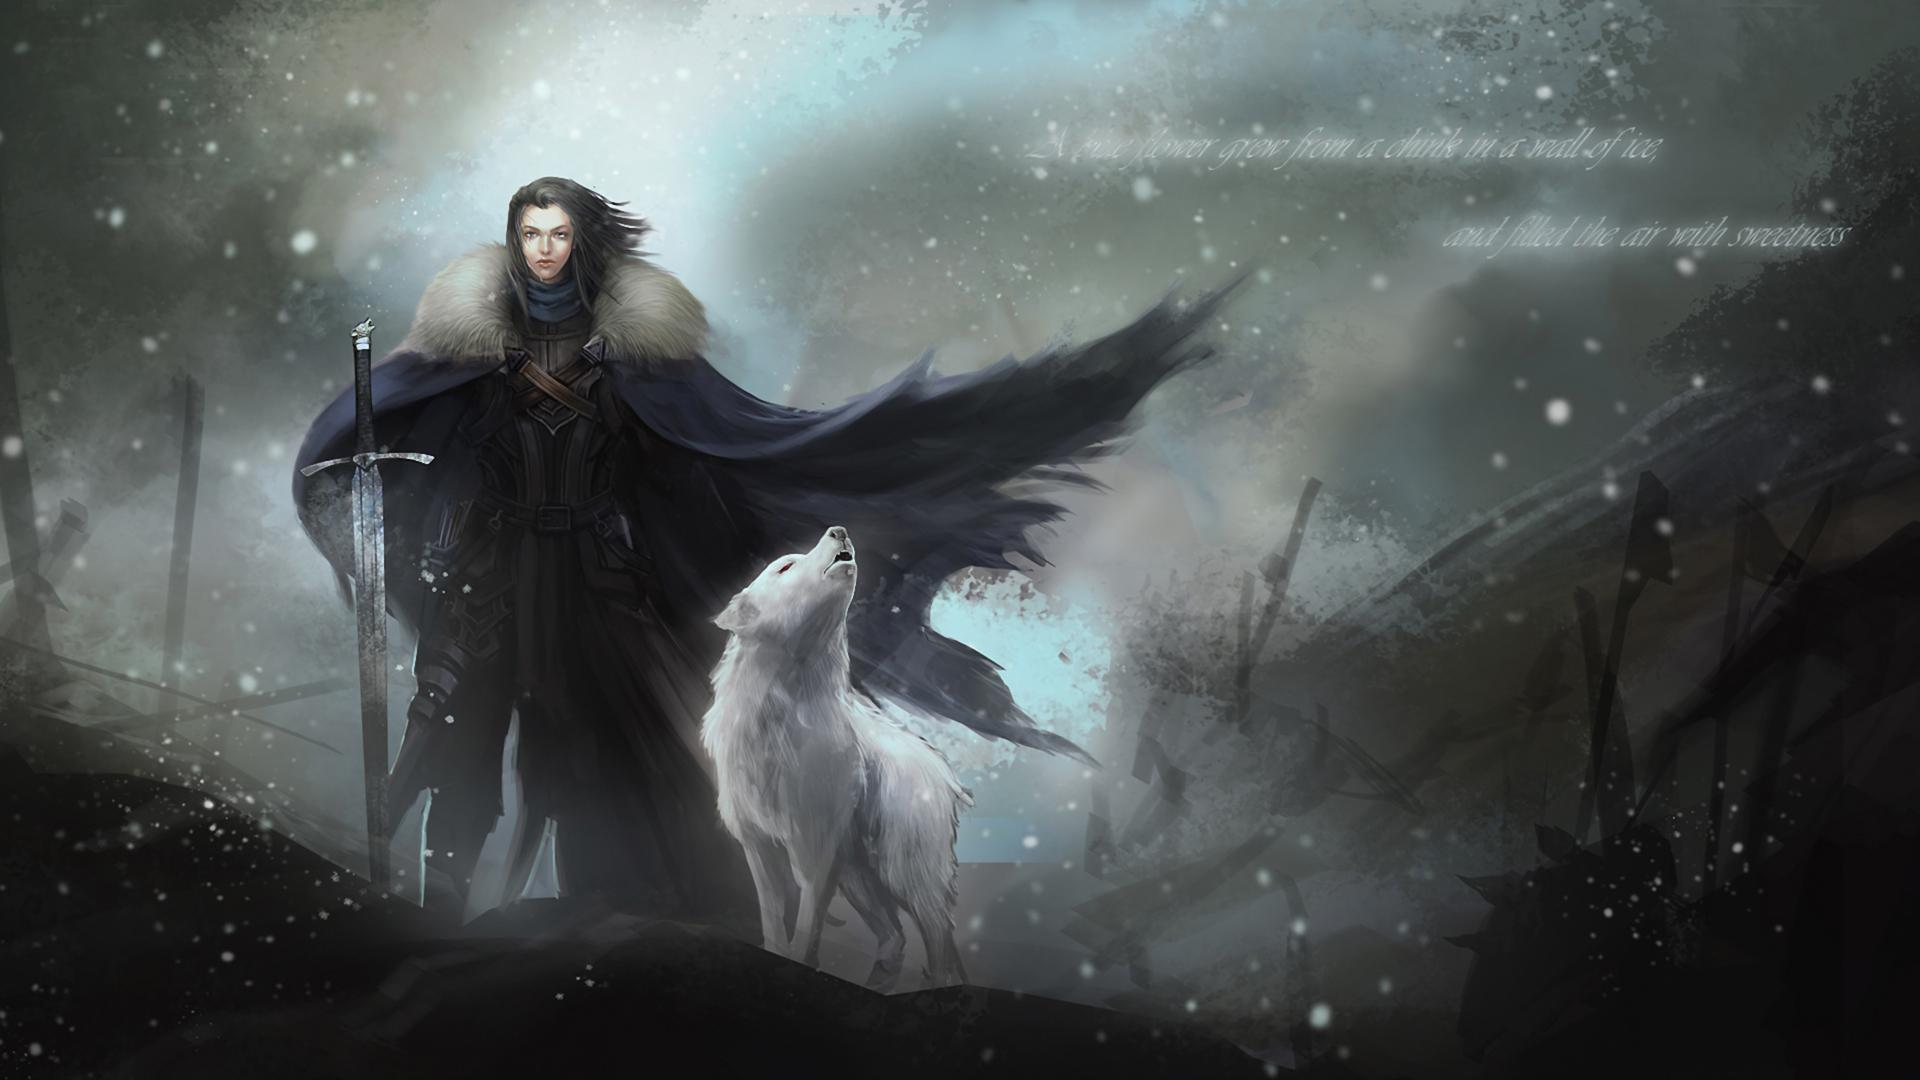 Game Of Thrones Quotes Mobile Wallpaper Game Of Thrones Wallpaper Hd Free Download Pixelstalk Net